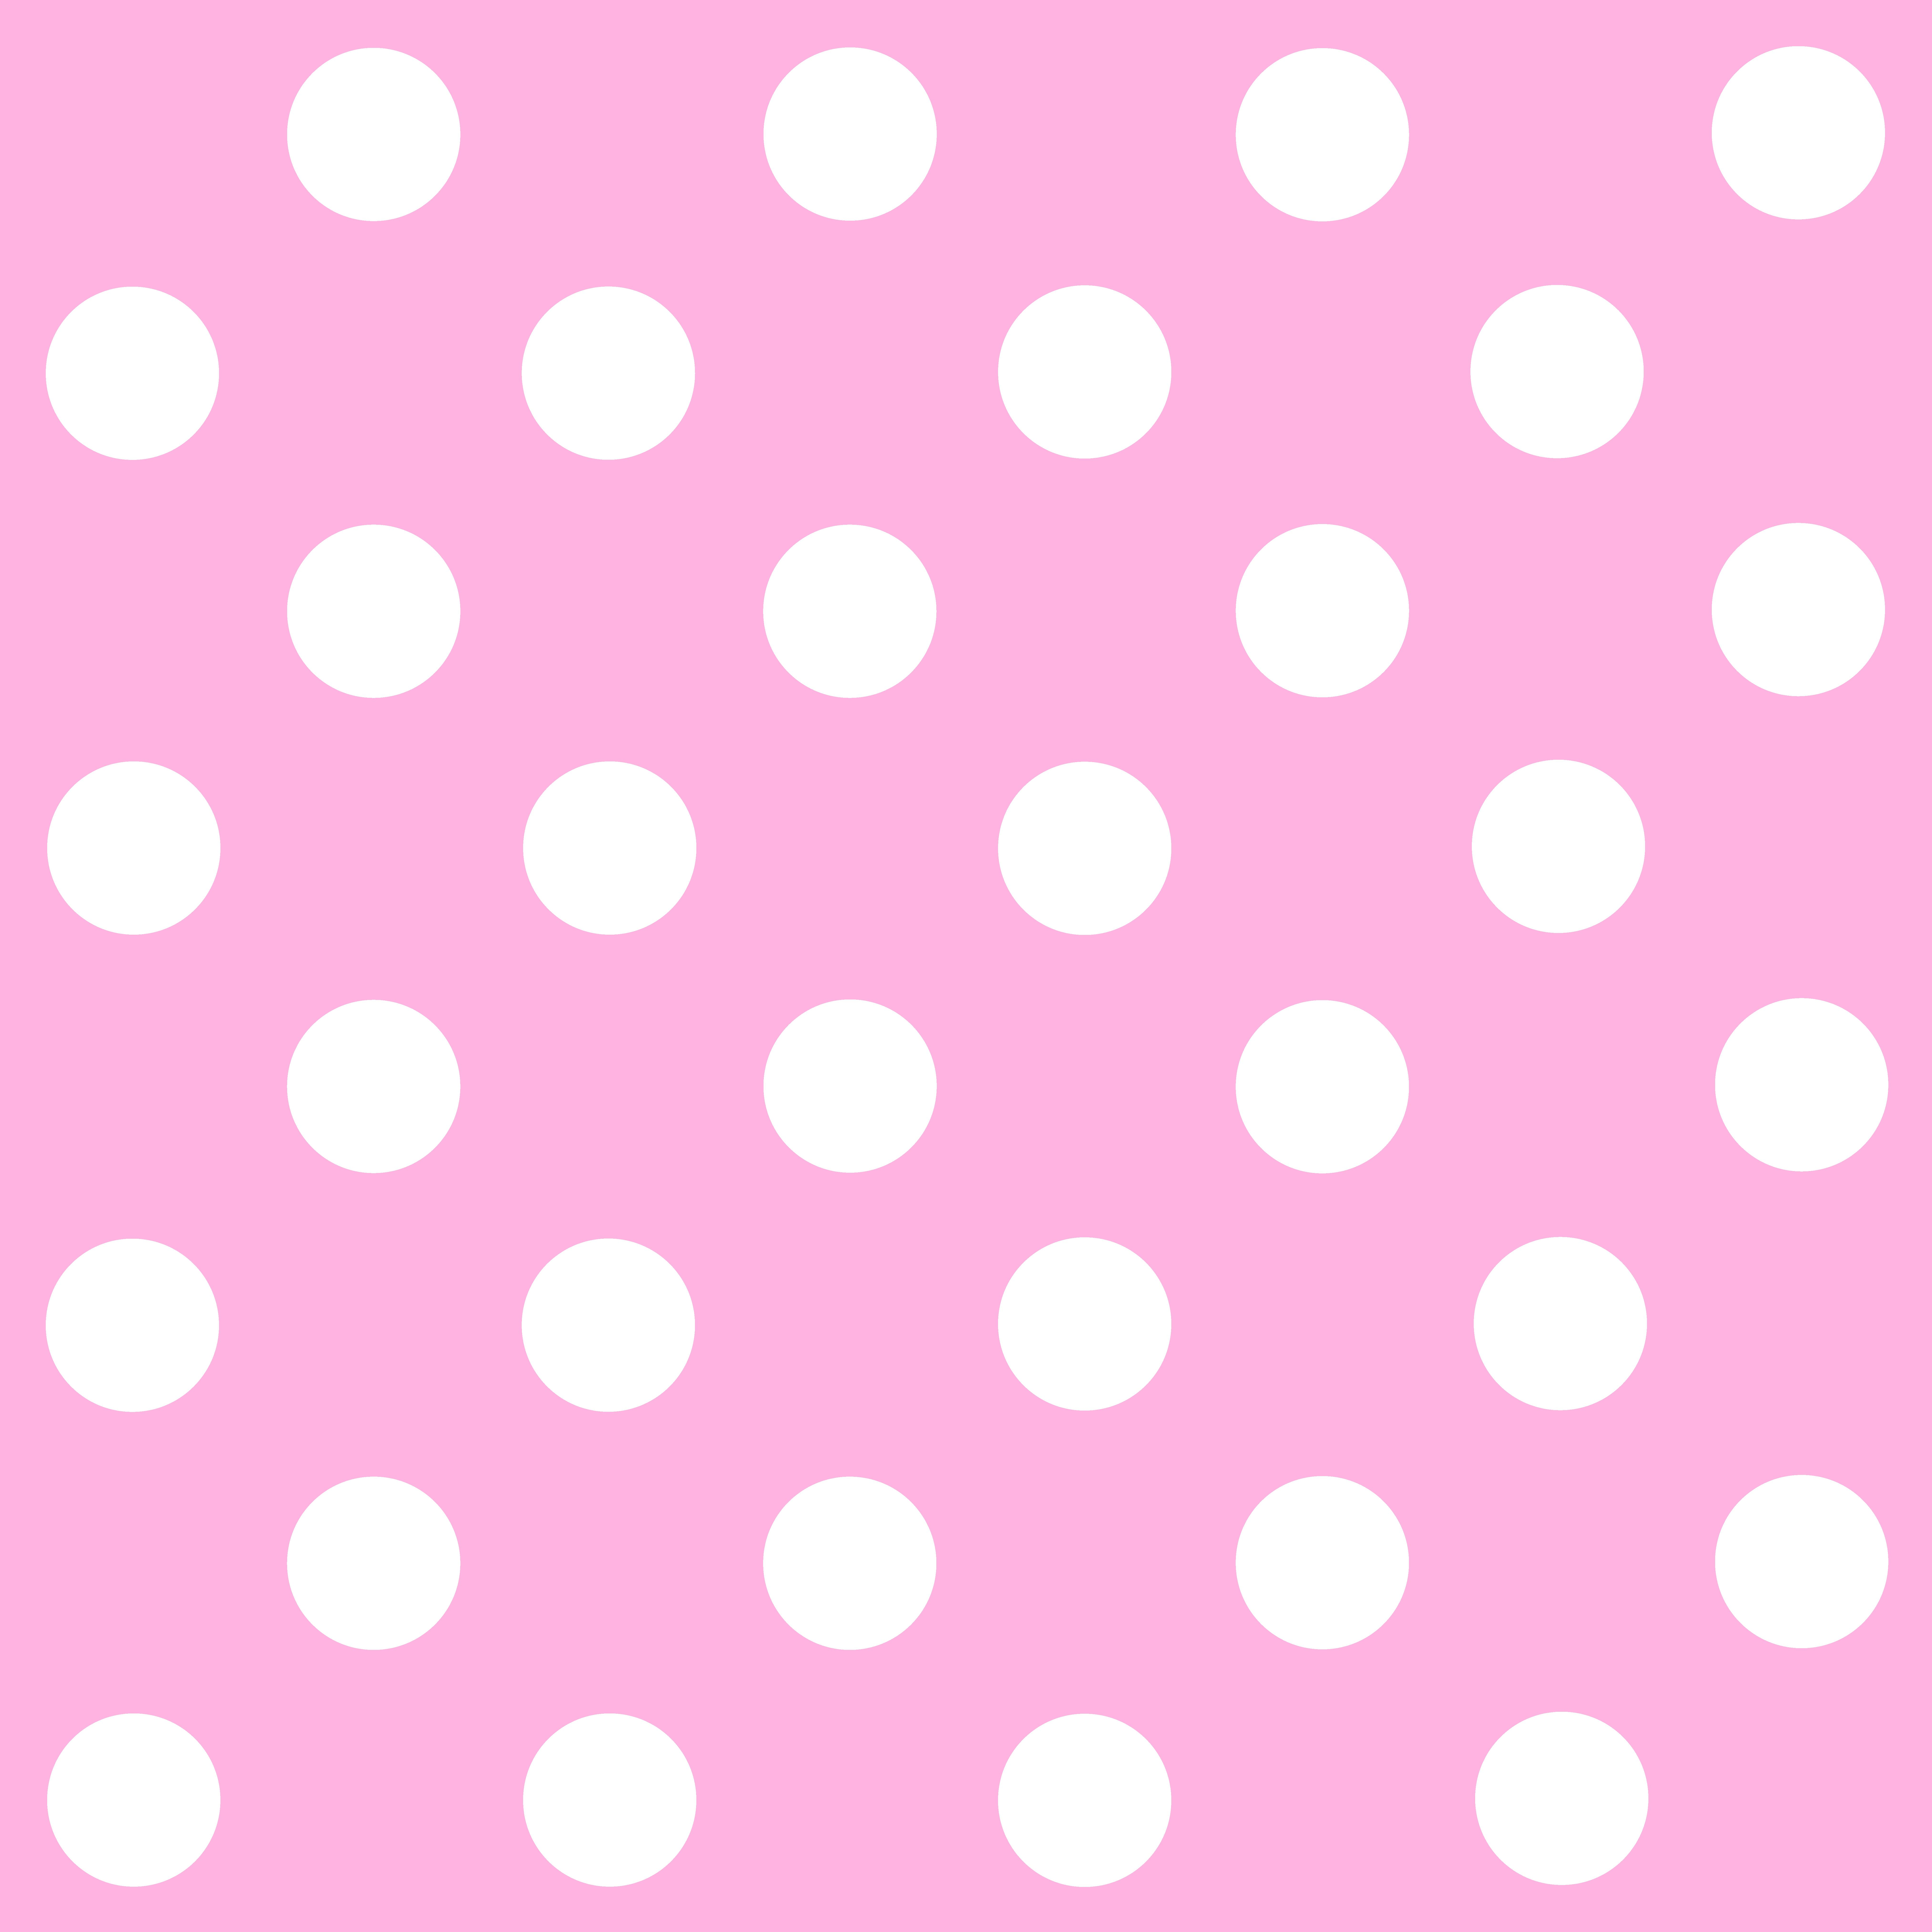 pink white. Pattern Dots Pink White Clip Art